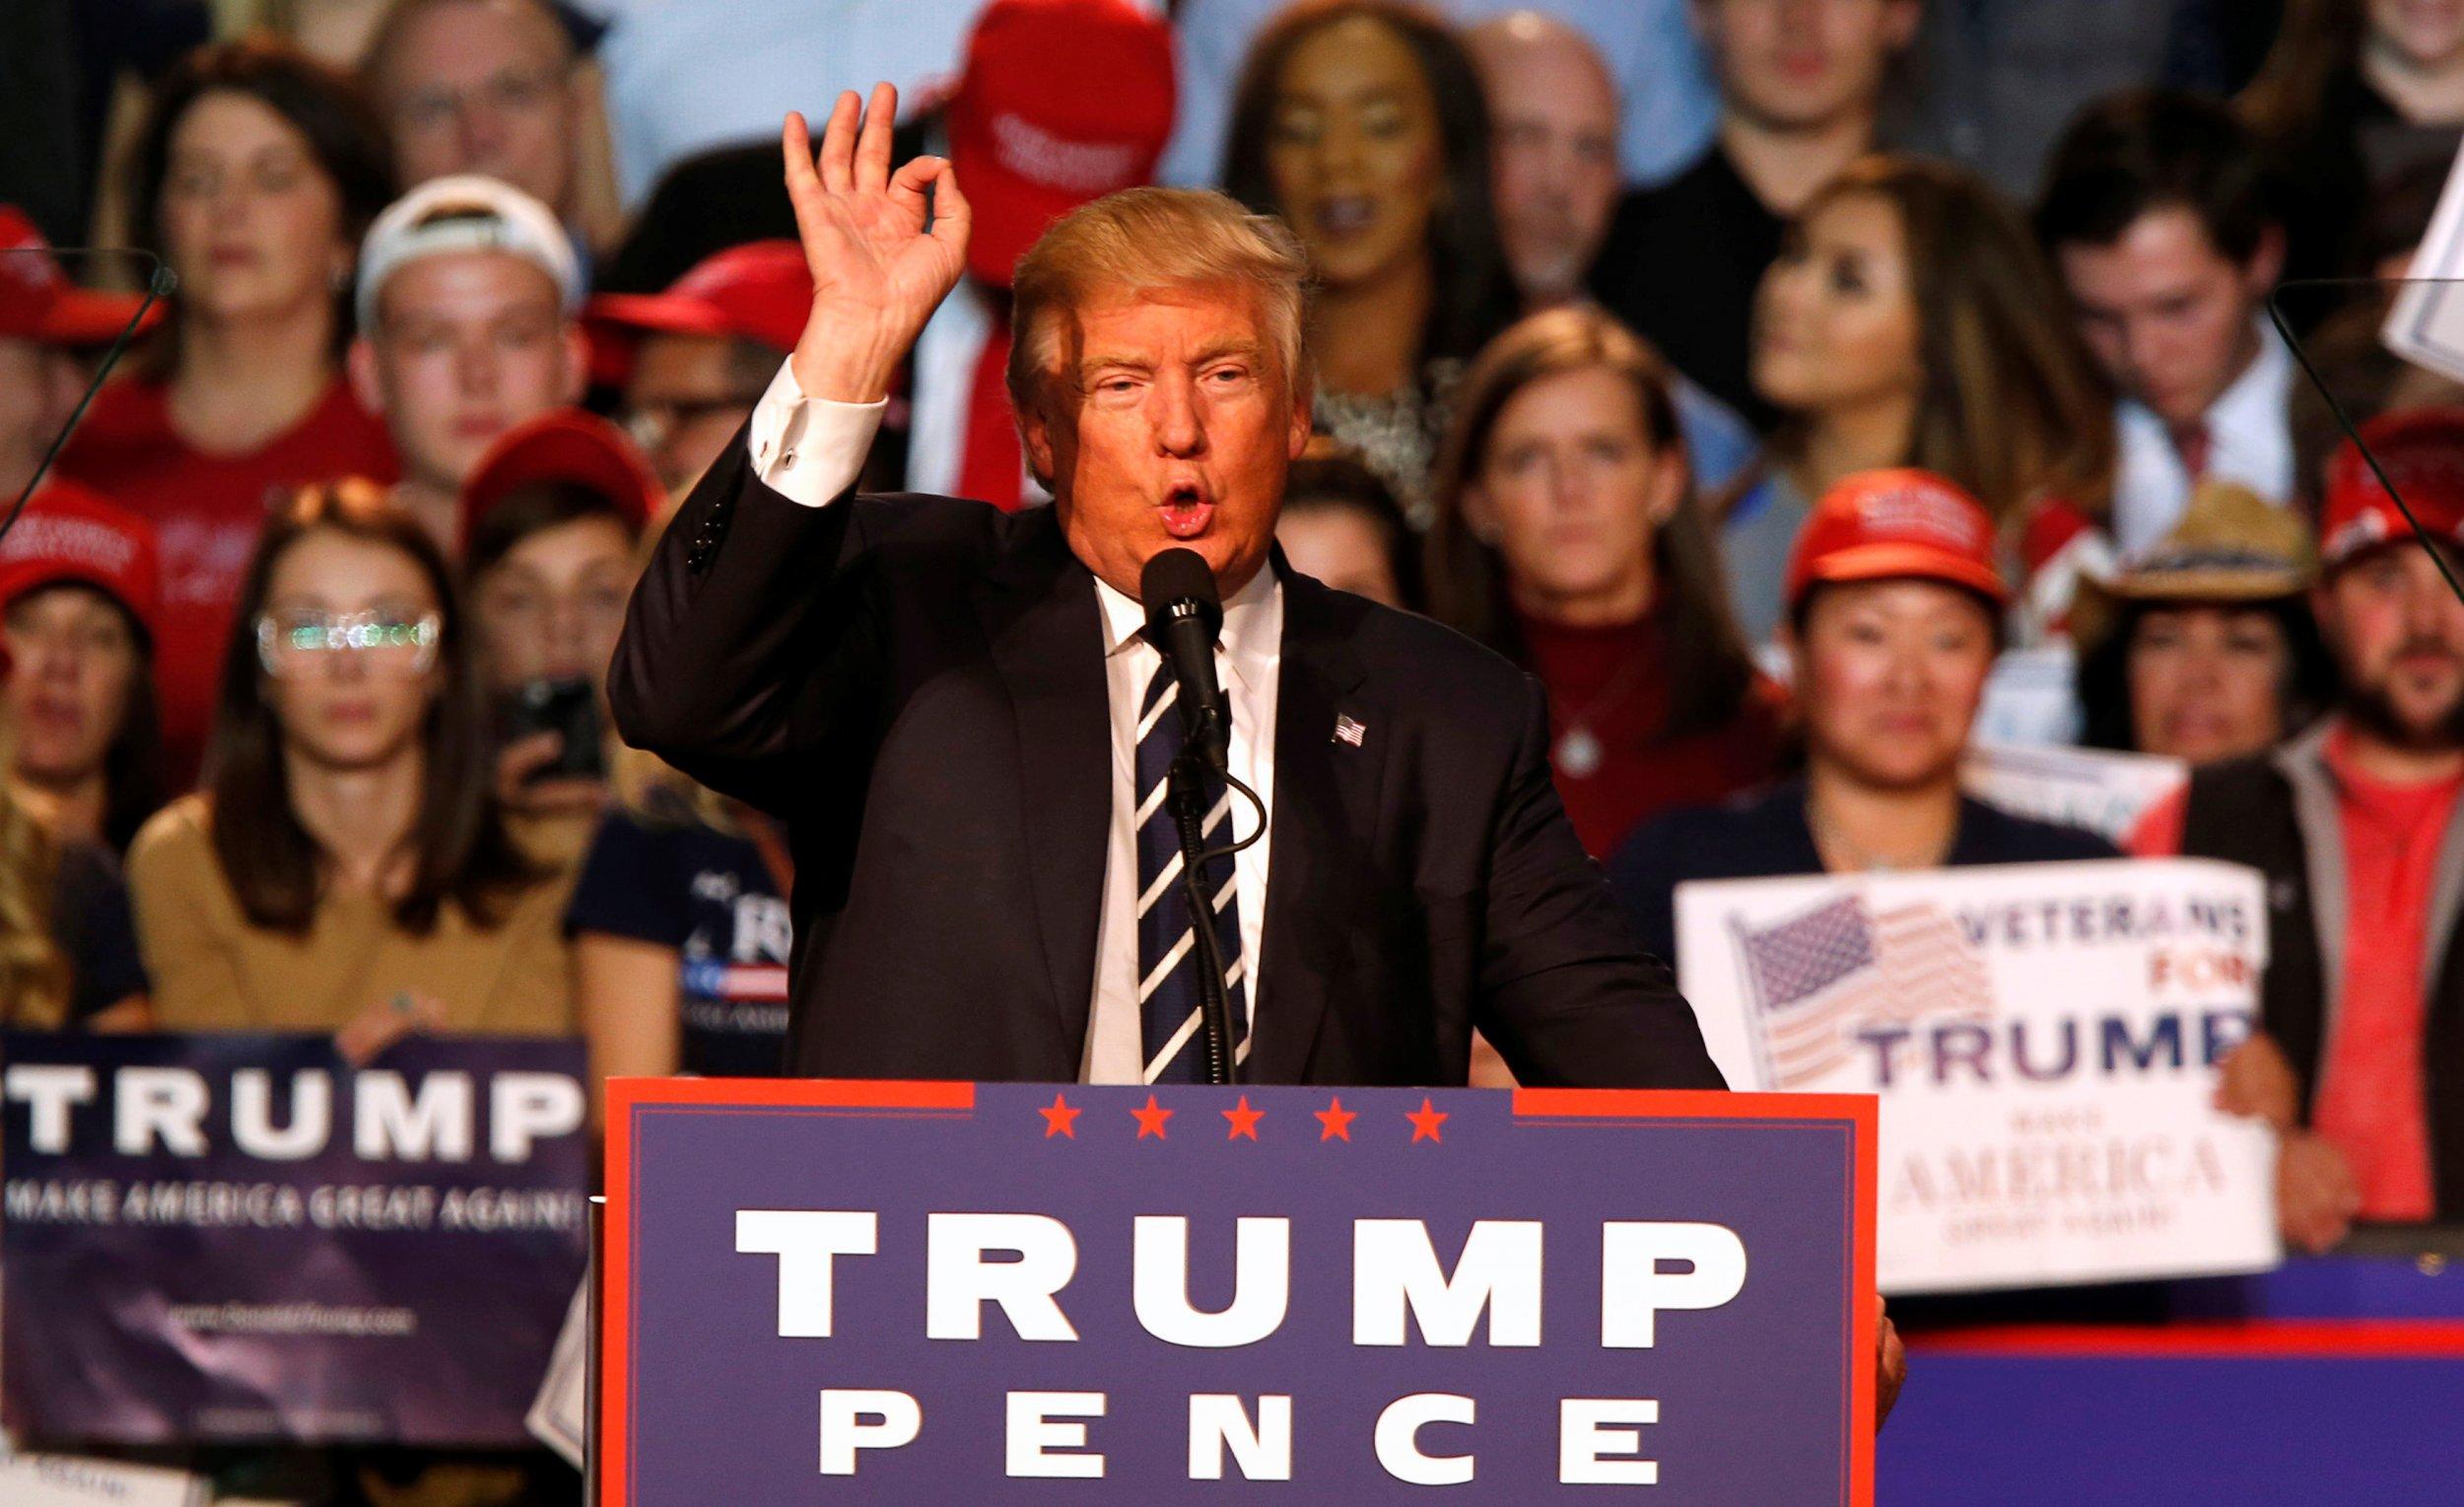 Donald Trump wins Michigan